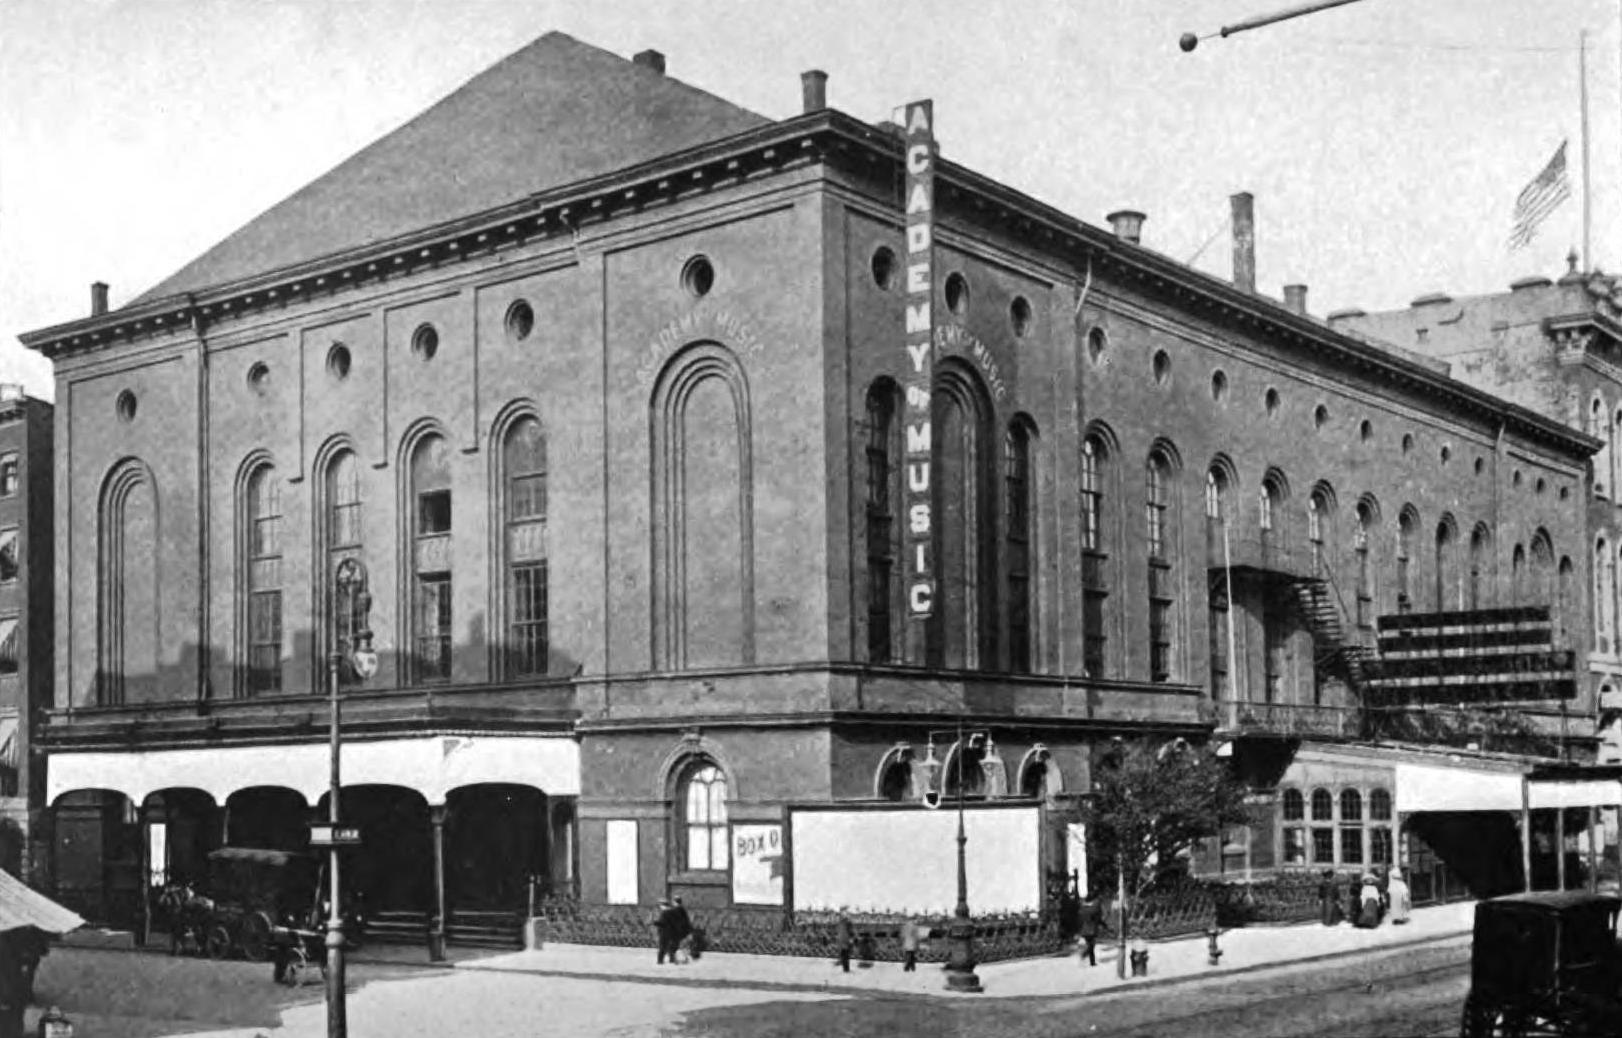 Academy of Music (New York City) - Wikipedia